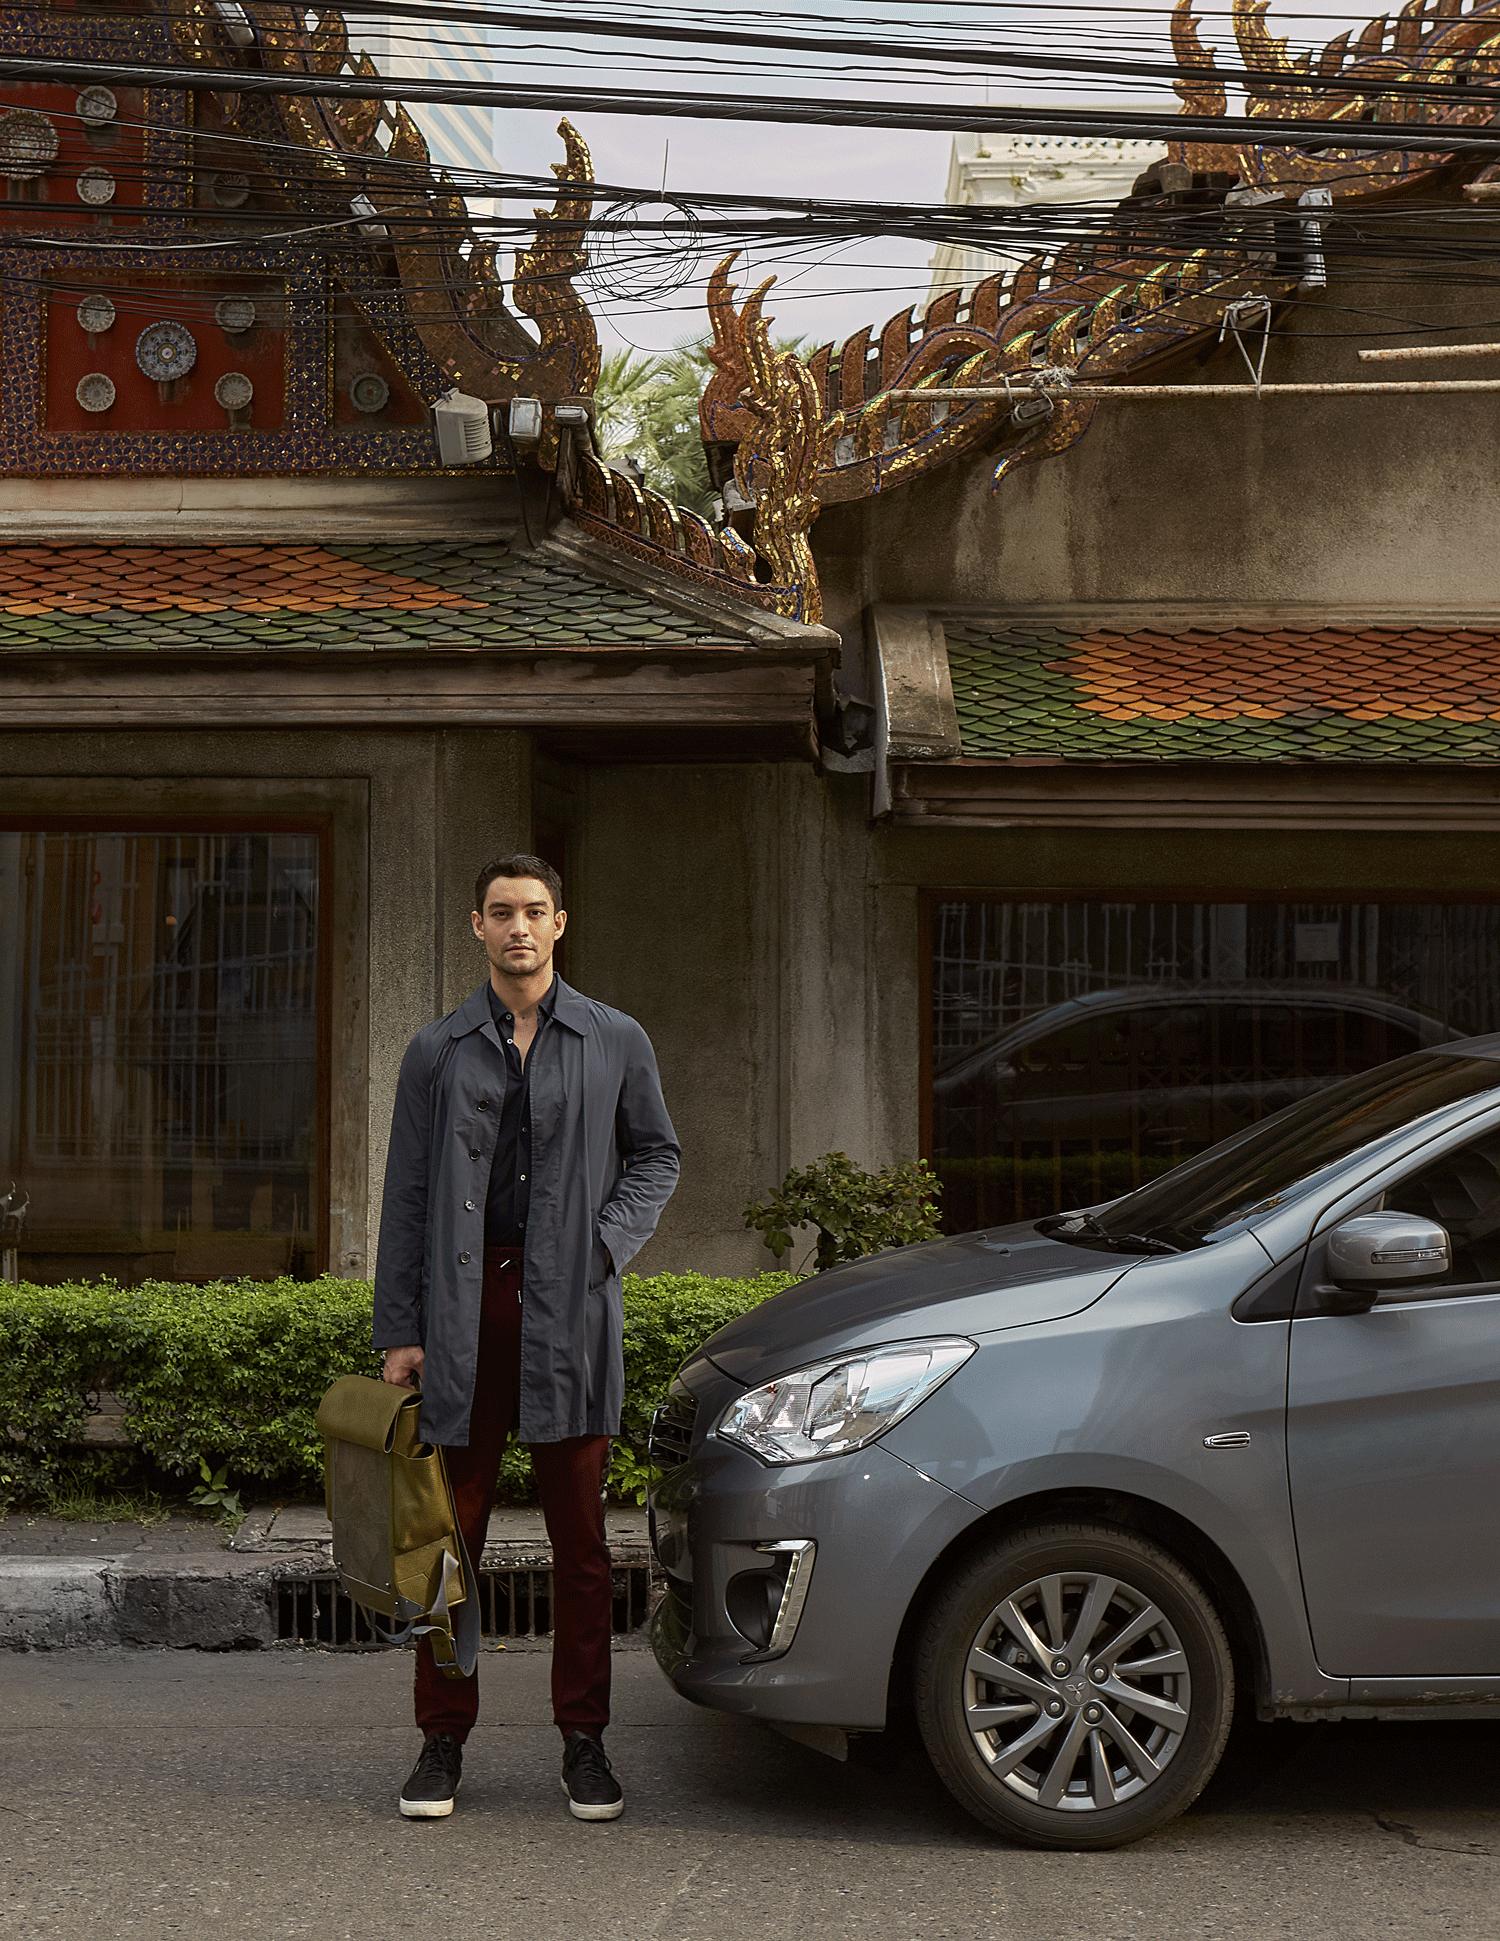 car : Mitsubishi NEW Attrage  shirt : Jil Sander / pants : Theatre / bag : FORREST